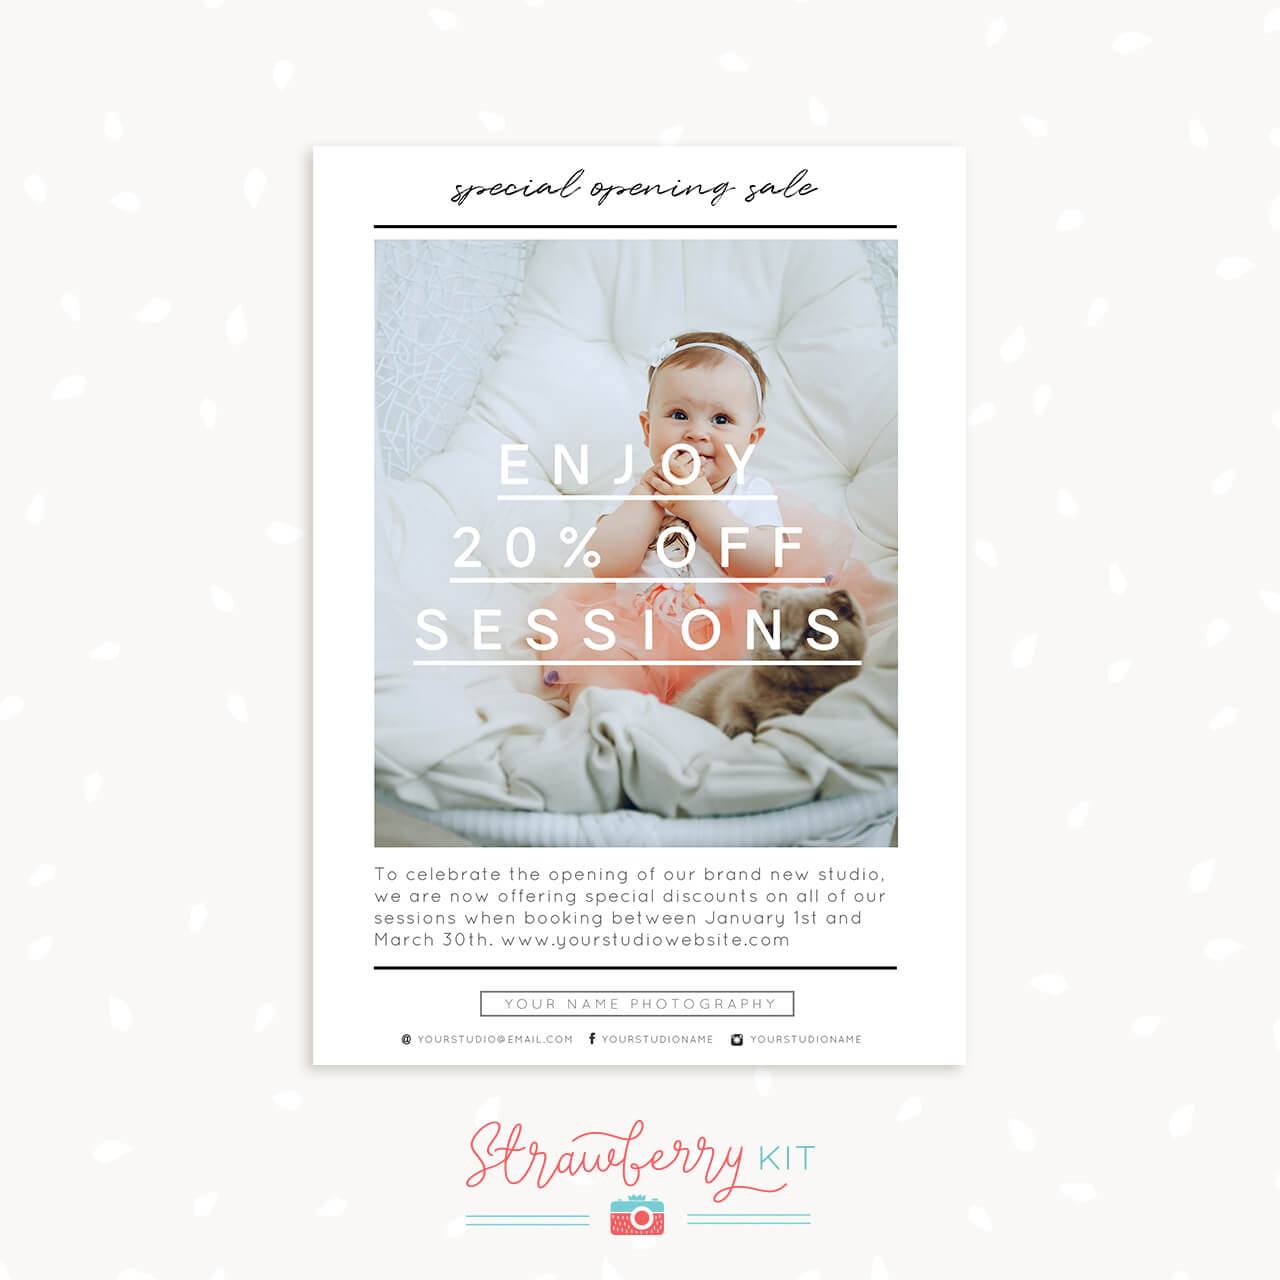 sale flyer template strawberry kit